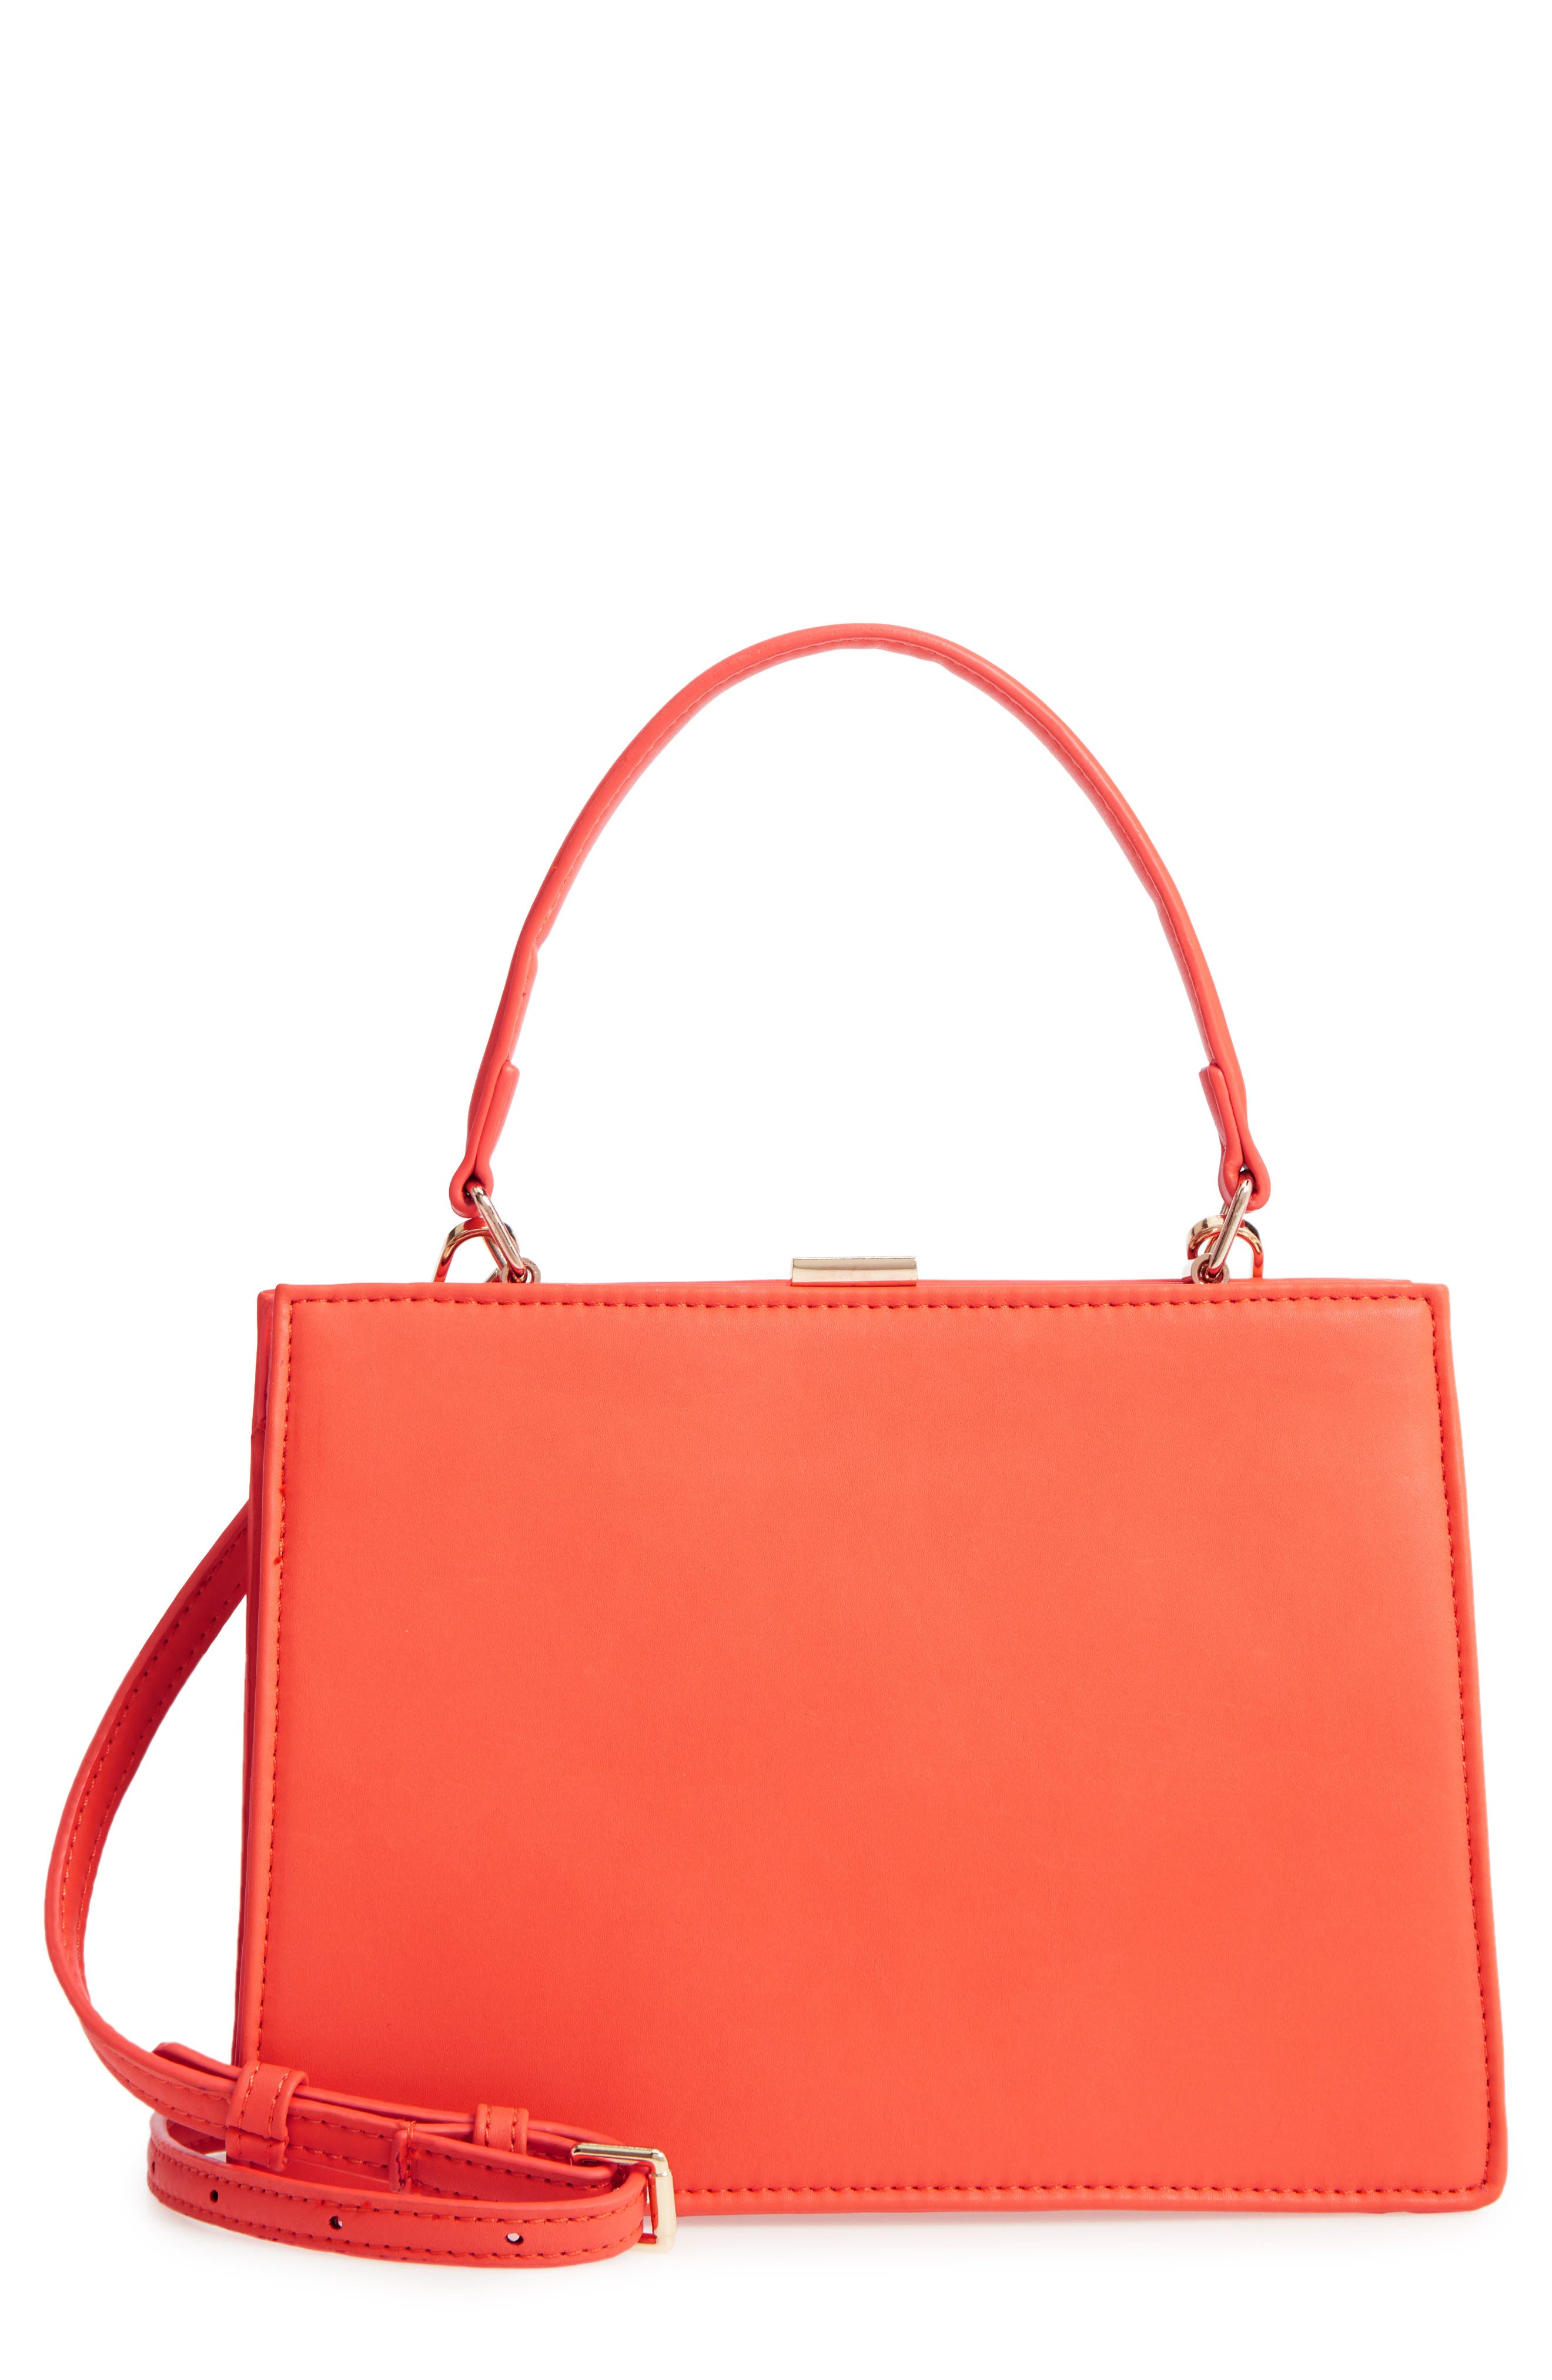 Faux Leather Frame Handbag,                         Main,                         color, Red